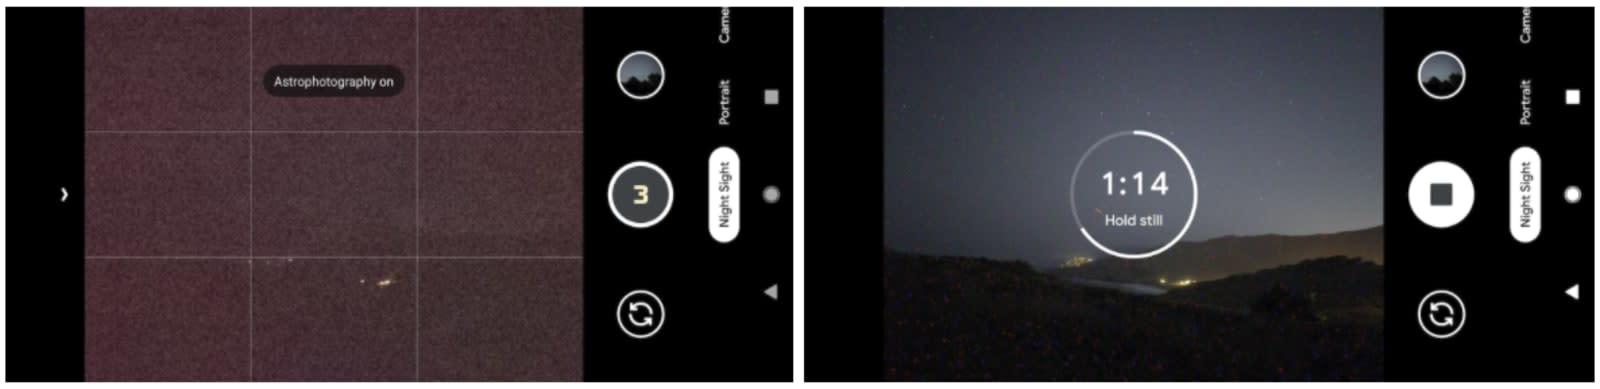 Google night sight pixel 4 astrophotography